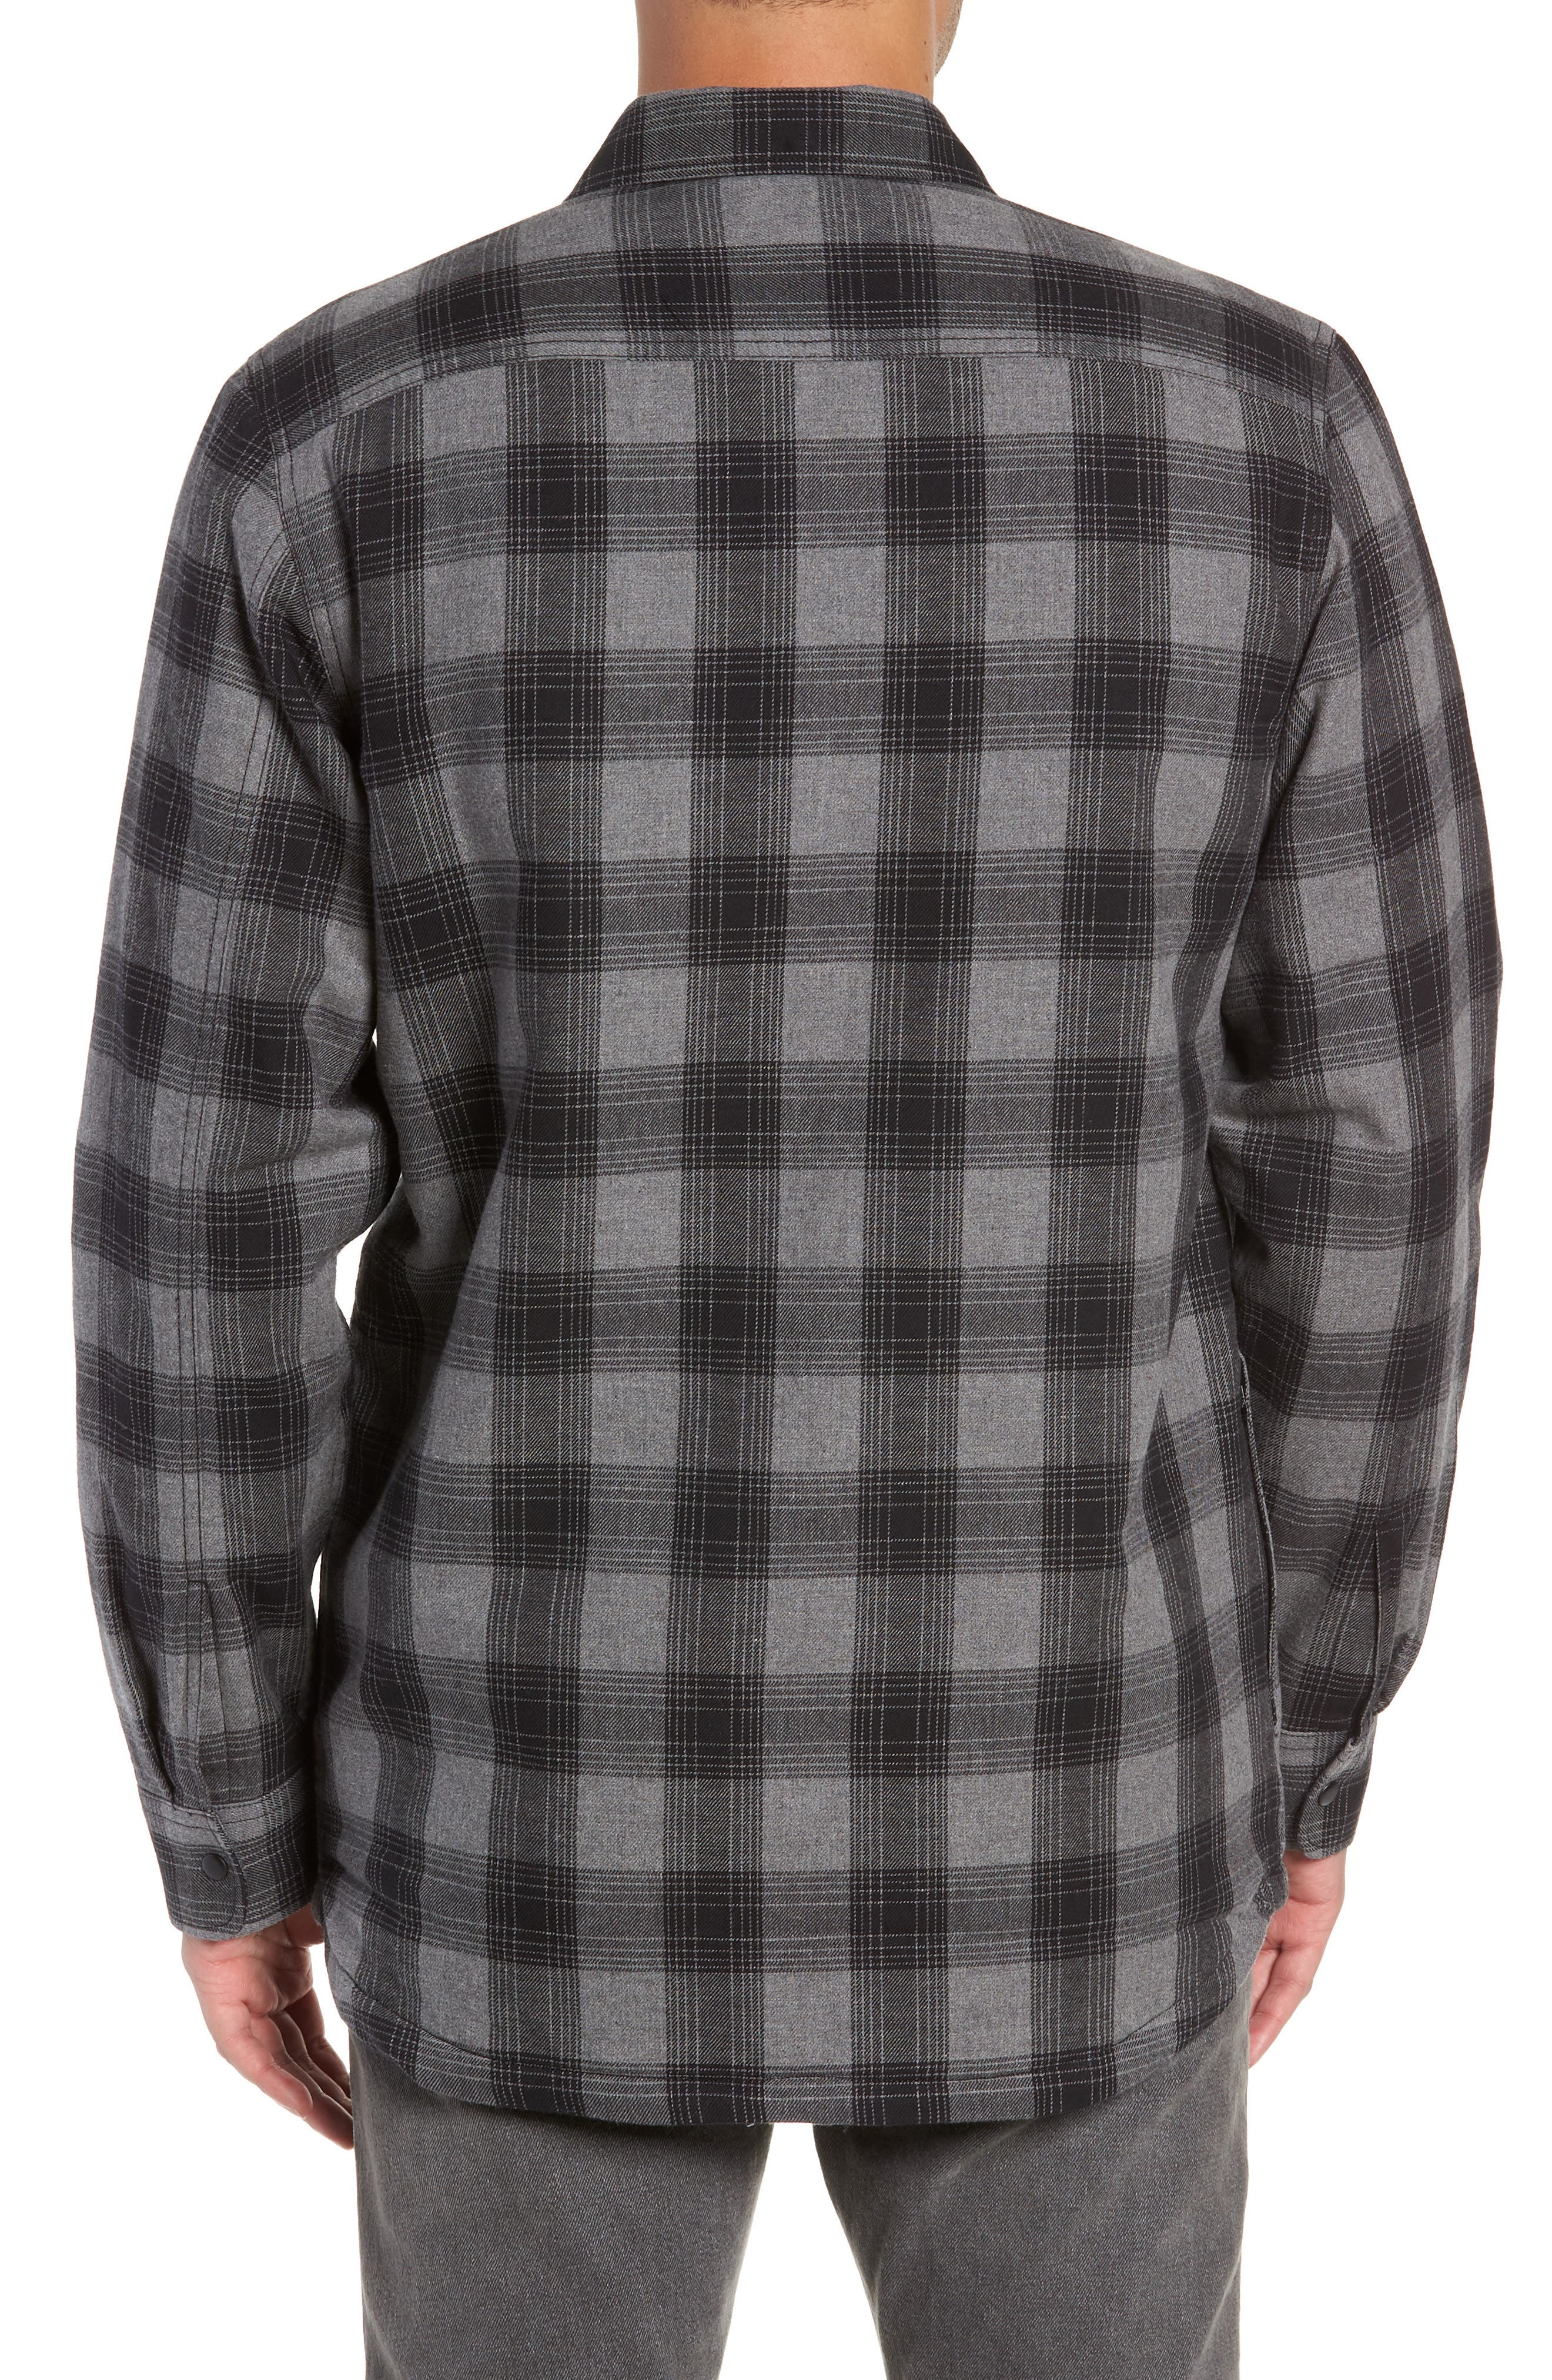 VANS,                             Parnell Plaid Shirt Jacket,                             Alternate thumbnail 2, color,                             GRAVEL HEATHER